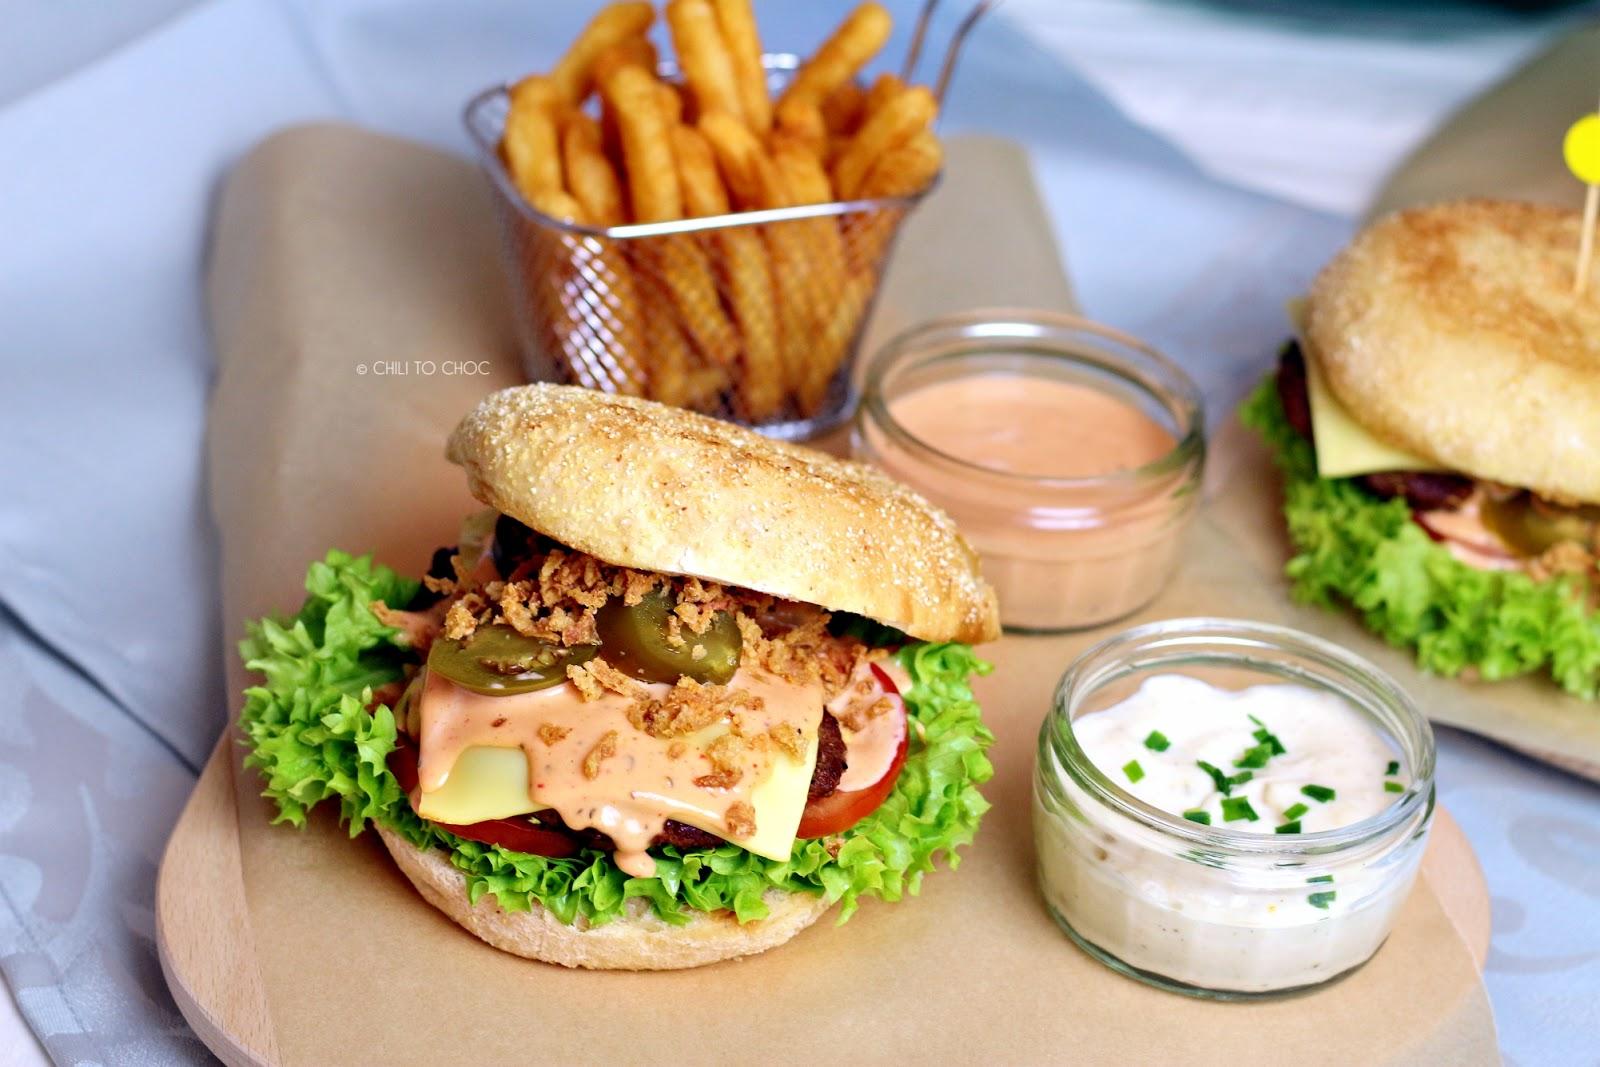 Zesty Jalapeno Beef Burger